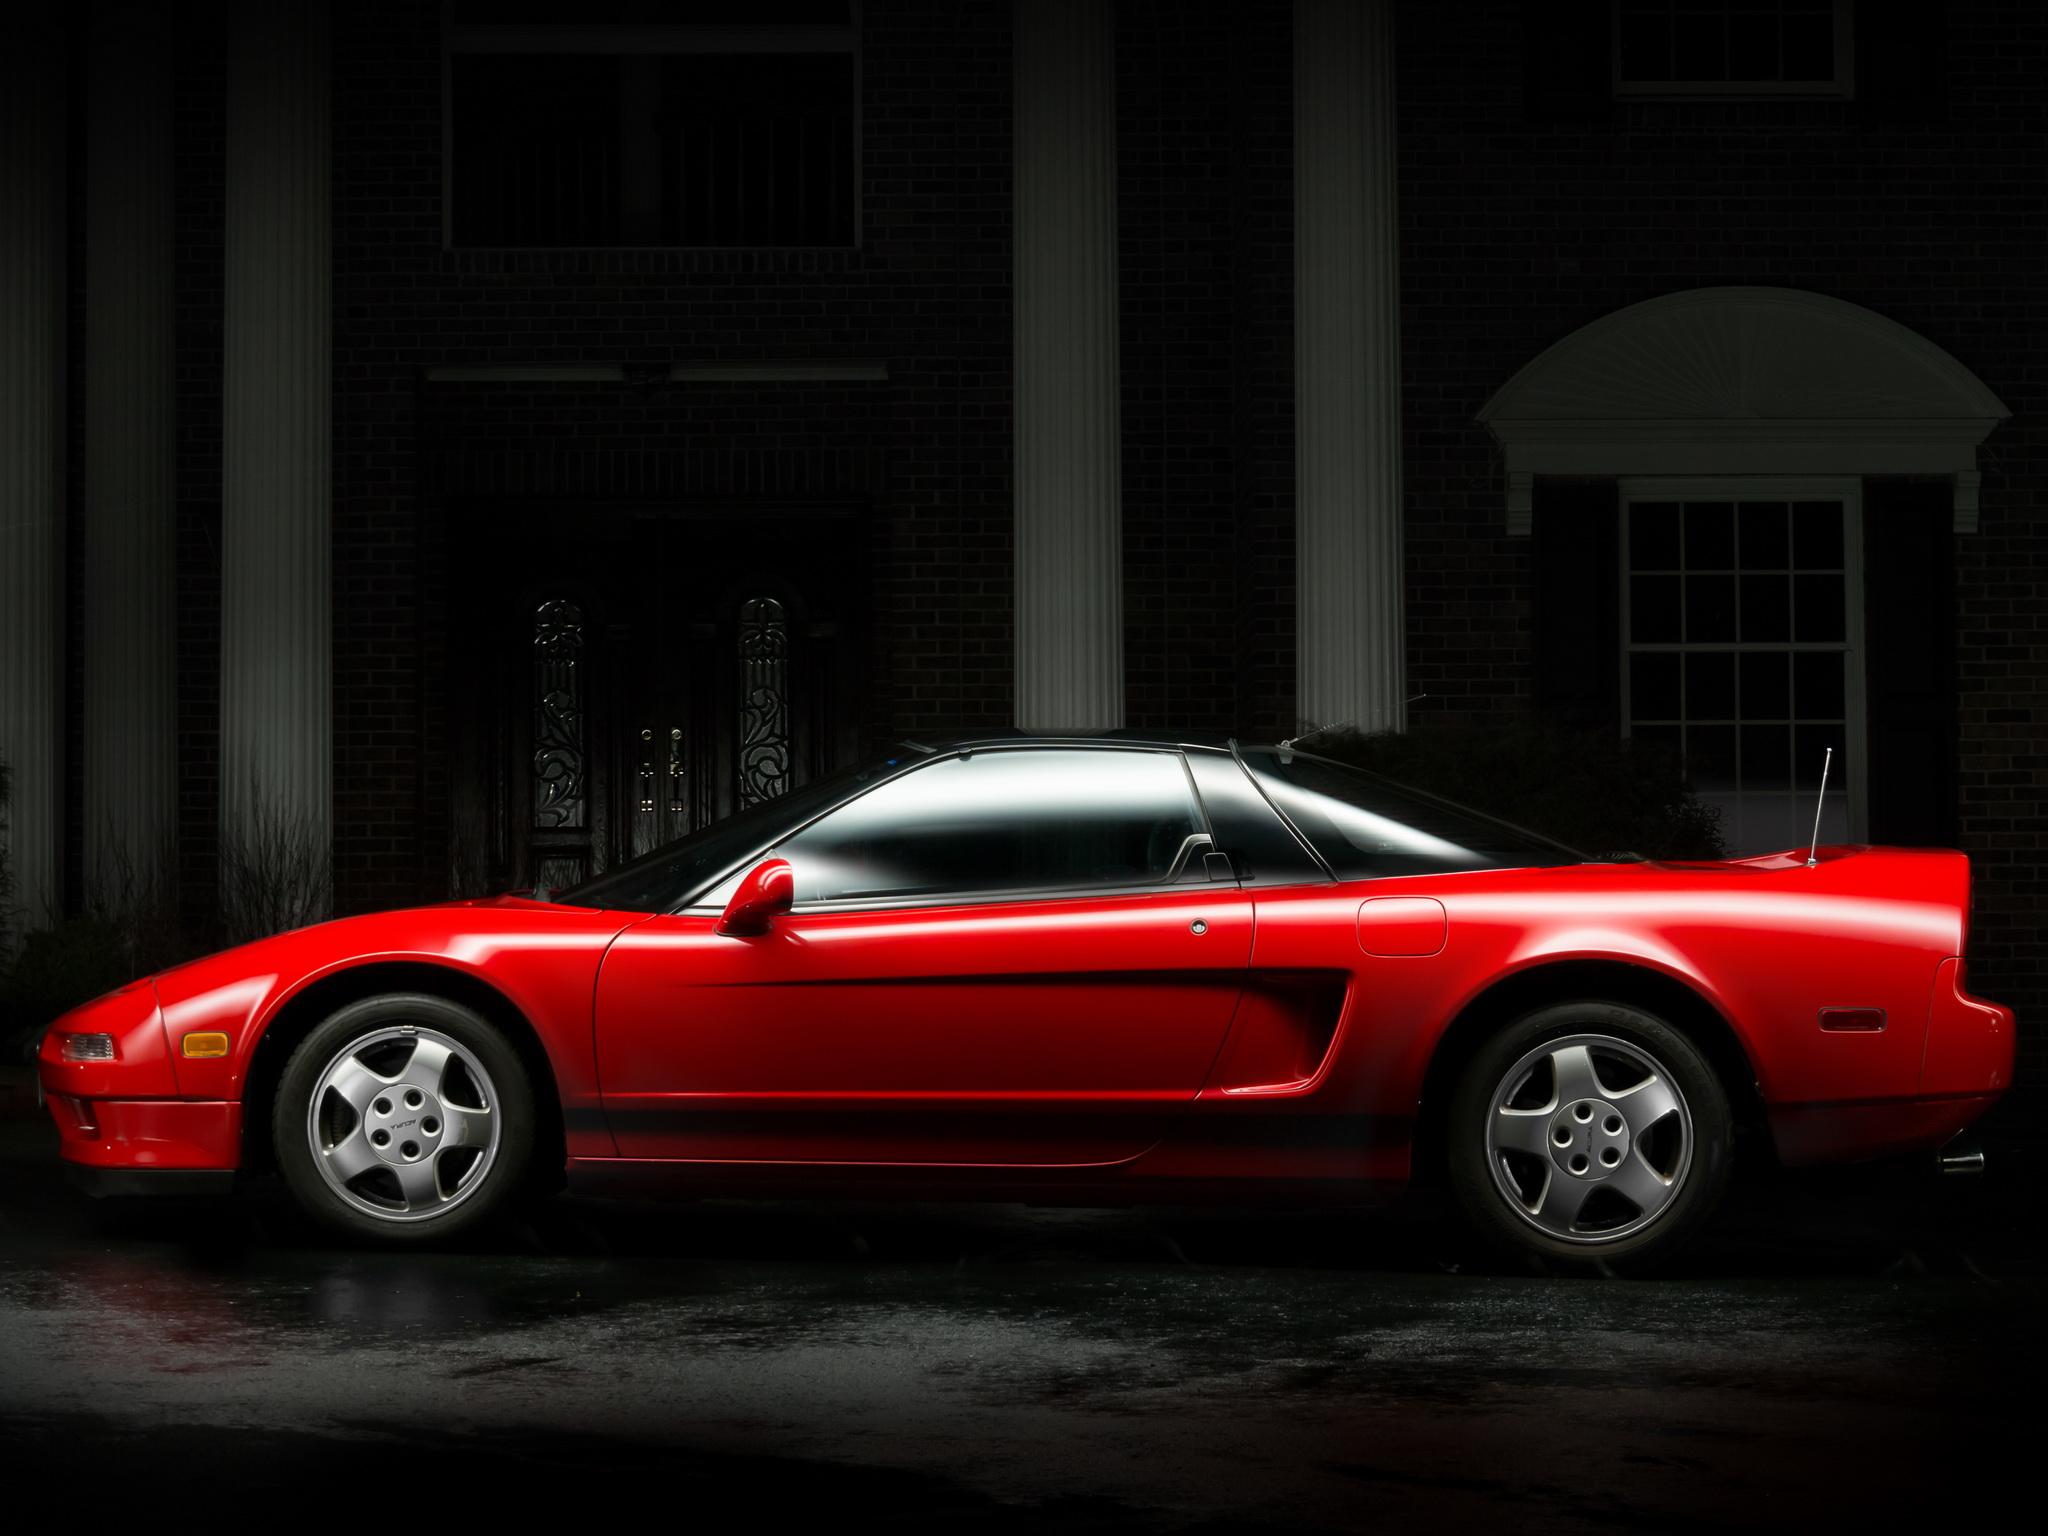 1991 acura nsx supercar supercars g wallpaper 2048x1536 116139 1991 acura nsx supercar supercars g wallpaper 2048x1536 116139 wallpaperup voltagebd Gallery